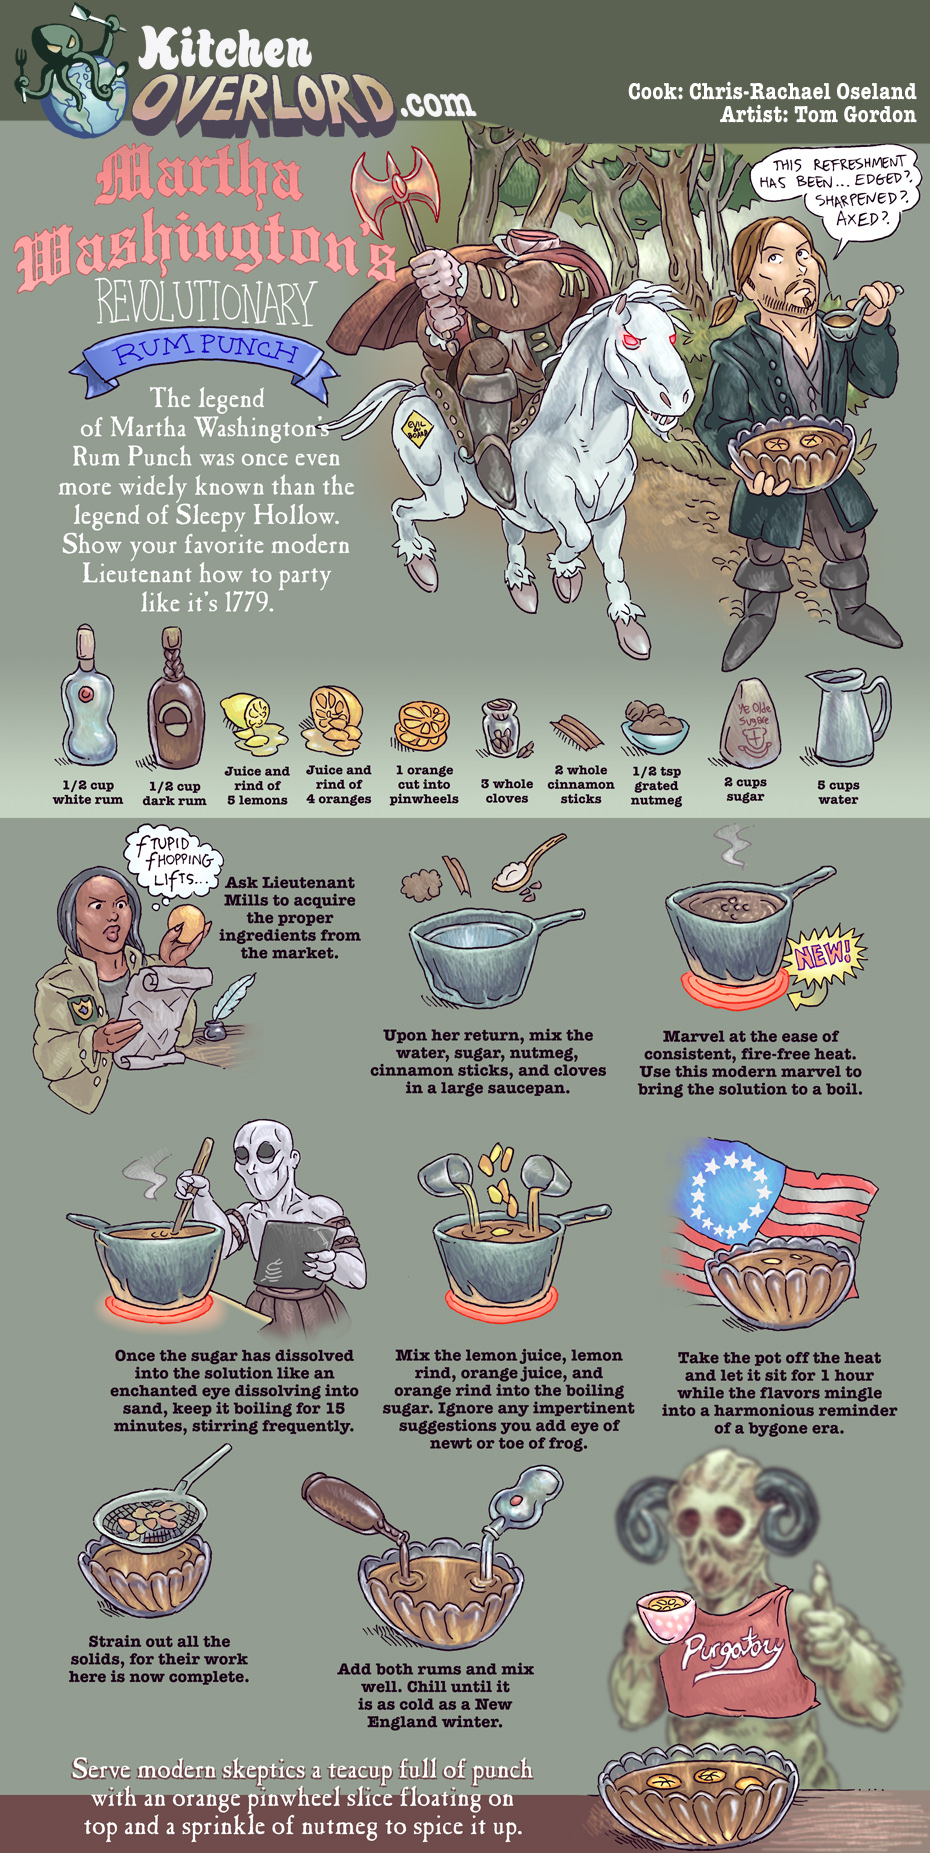 Kitchen Overlord Edible Art - Martha Washington's Revolutionary Rum Punch Inspired by Sleepy Hollow